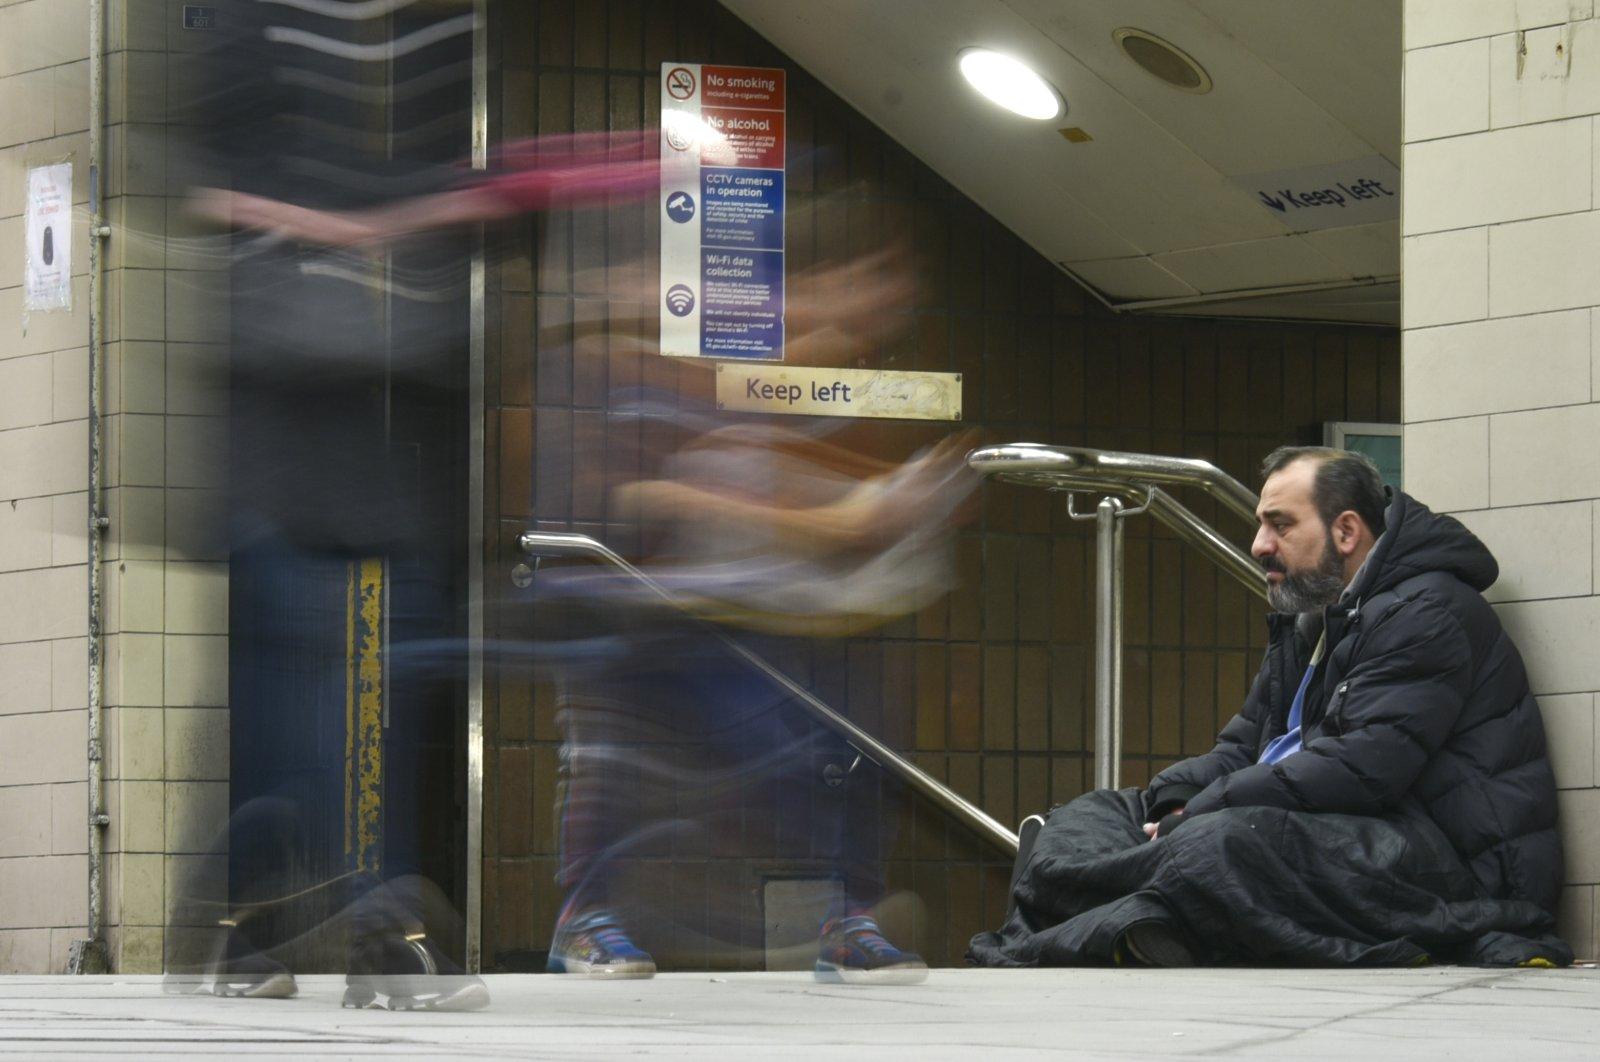 People walk past a homeless man outside Bond Street underground station, London, the U.K., Dec. 22, 2020. (AP Photo)